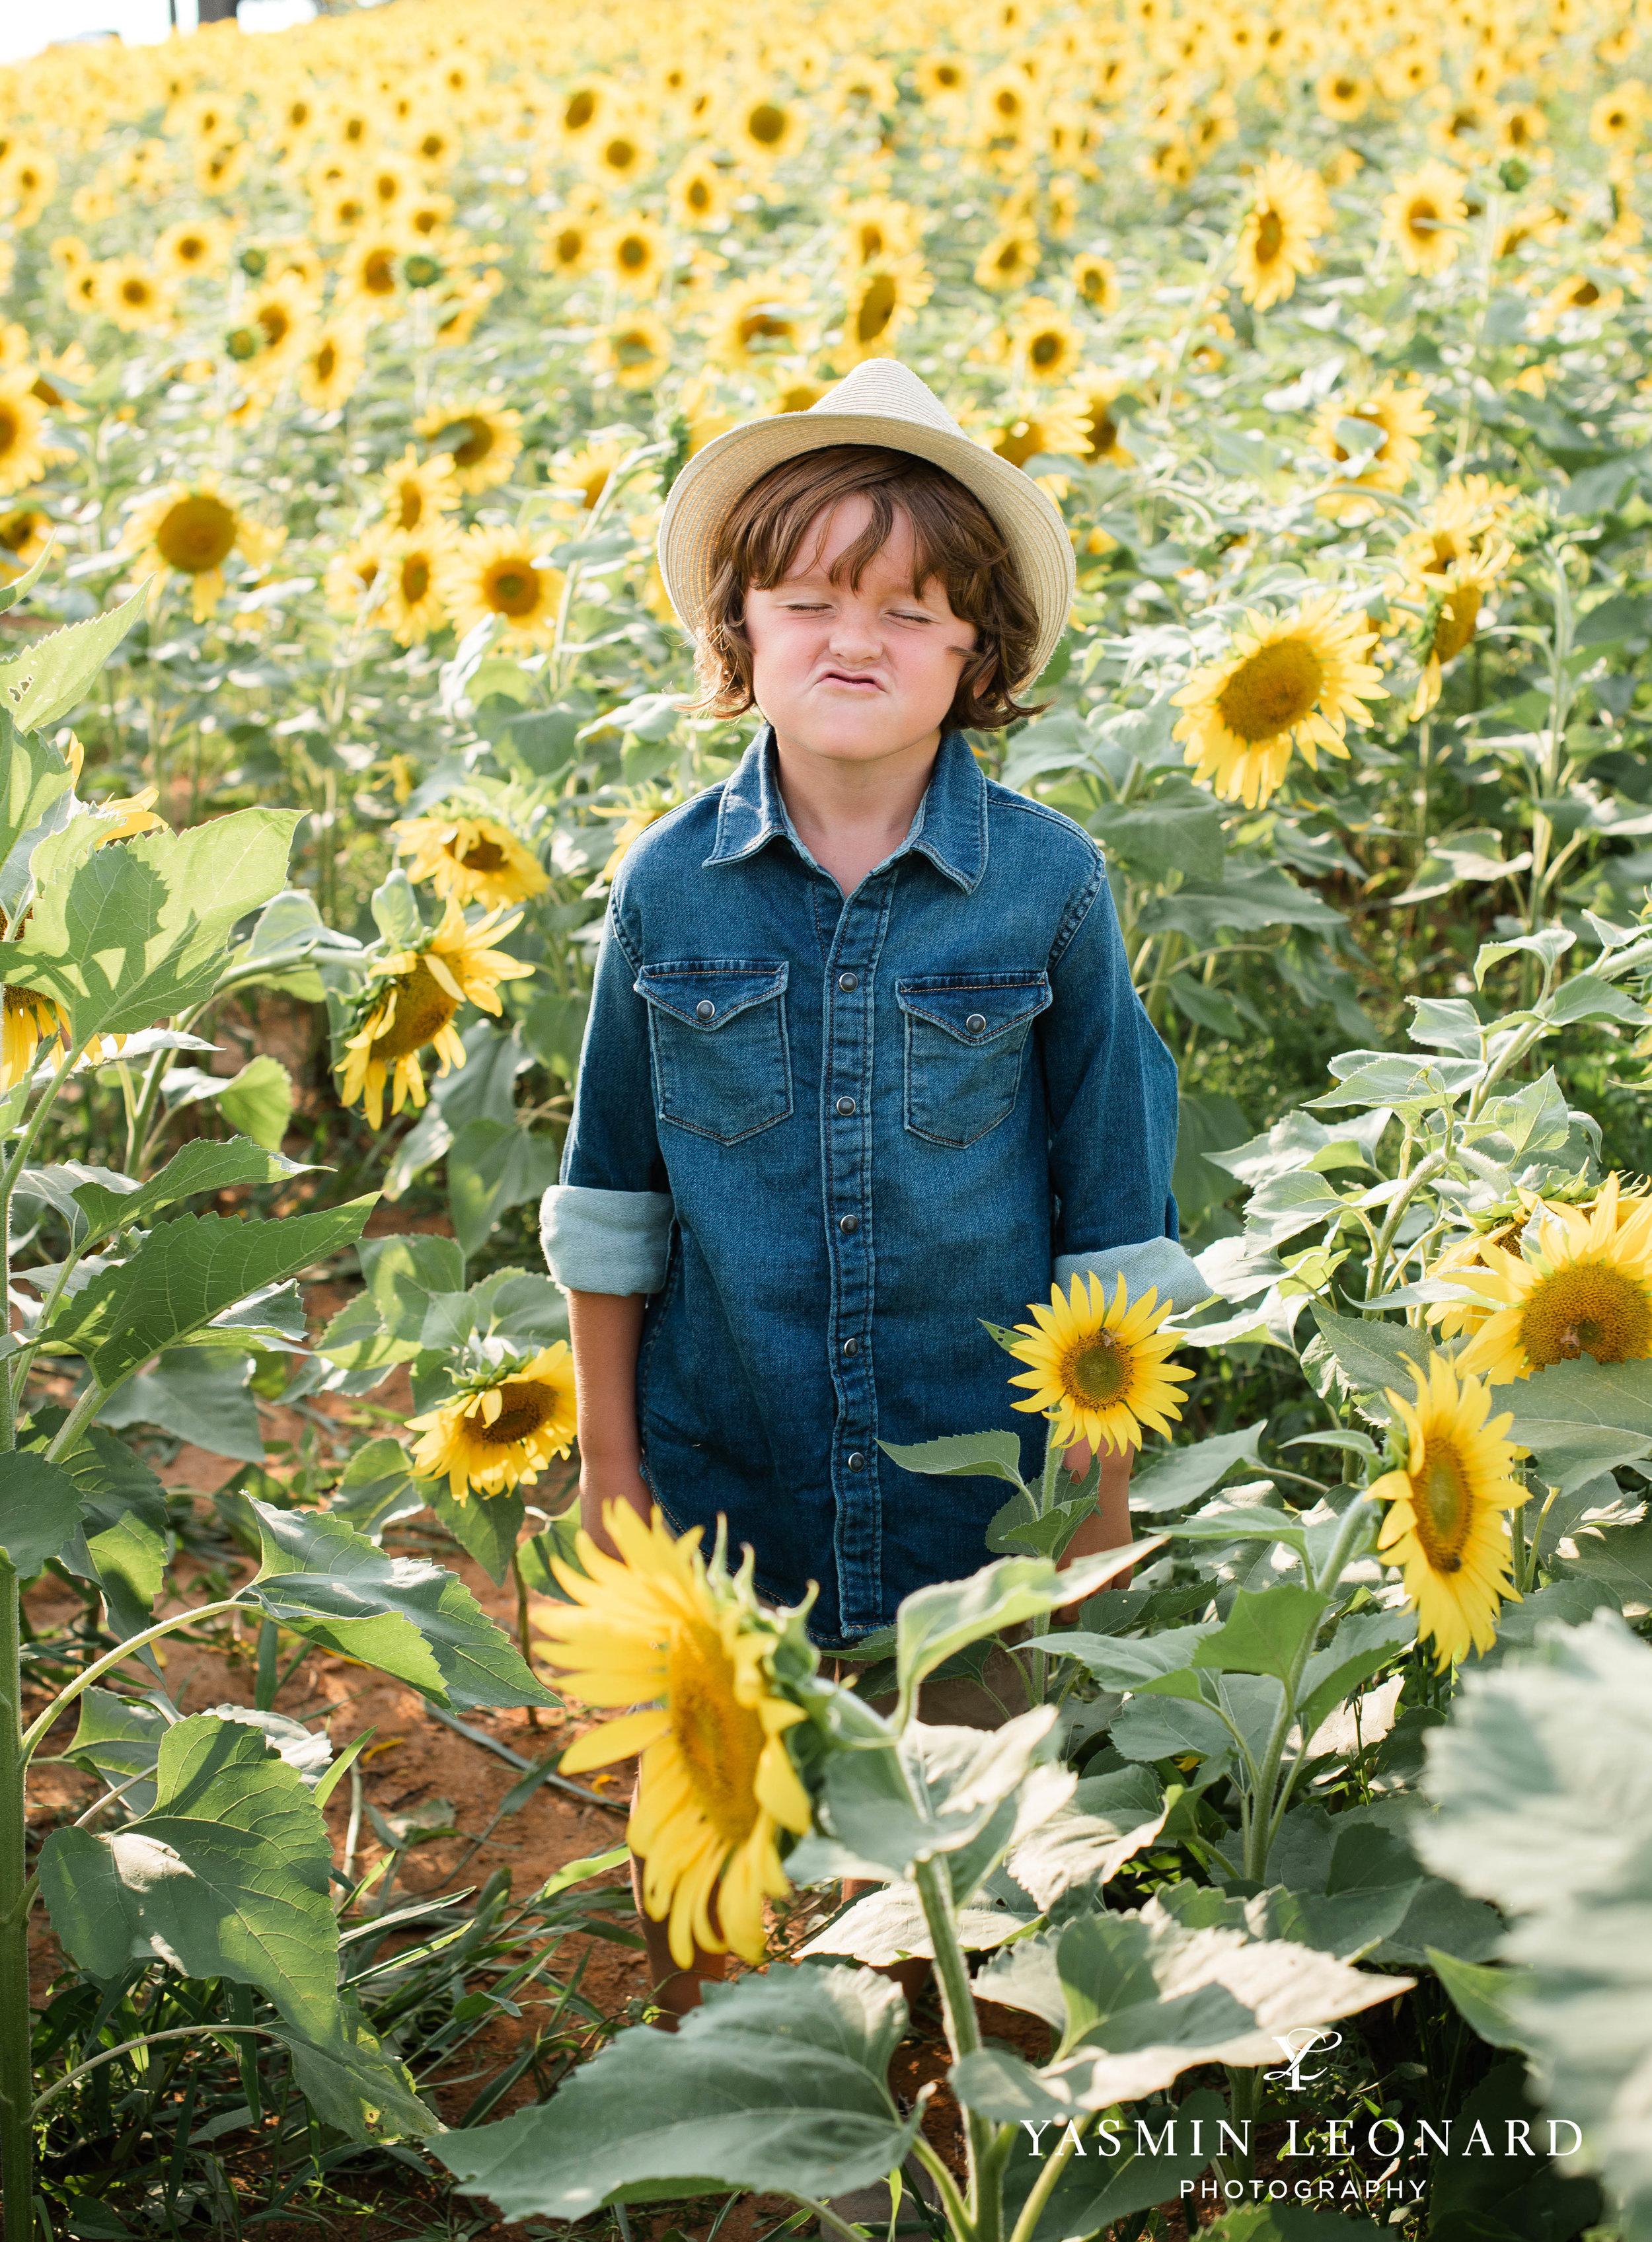 Sunflower Mini Session - Dogwood Farms - Sunflower Field - Boys in Sunflower Field - What to wear sunflower field - Yasmin Leonard Photography-4.jpg